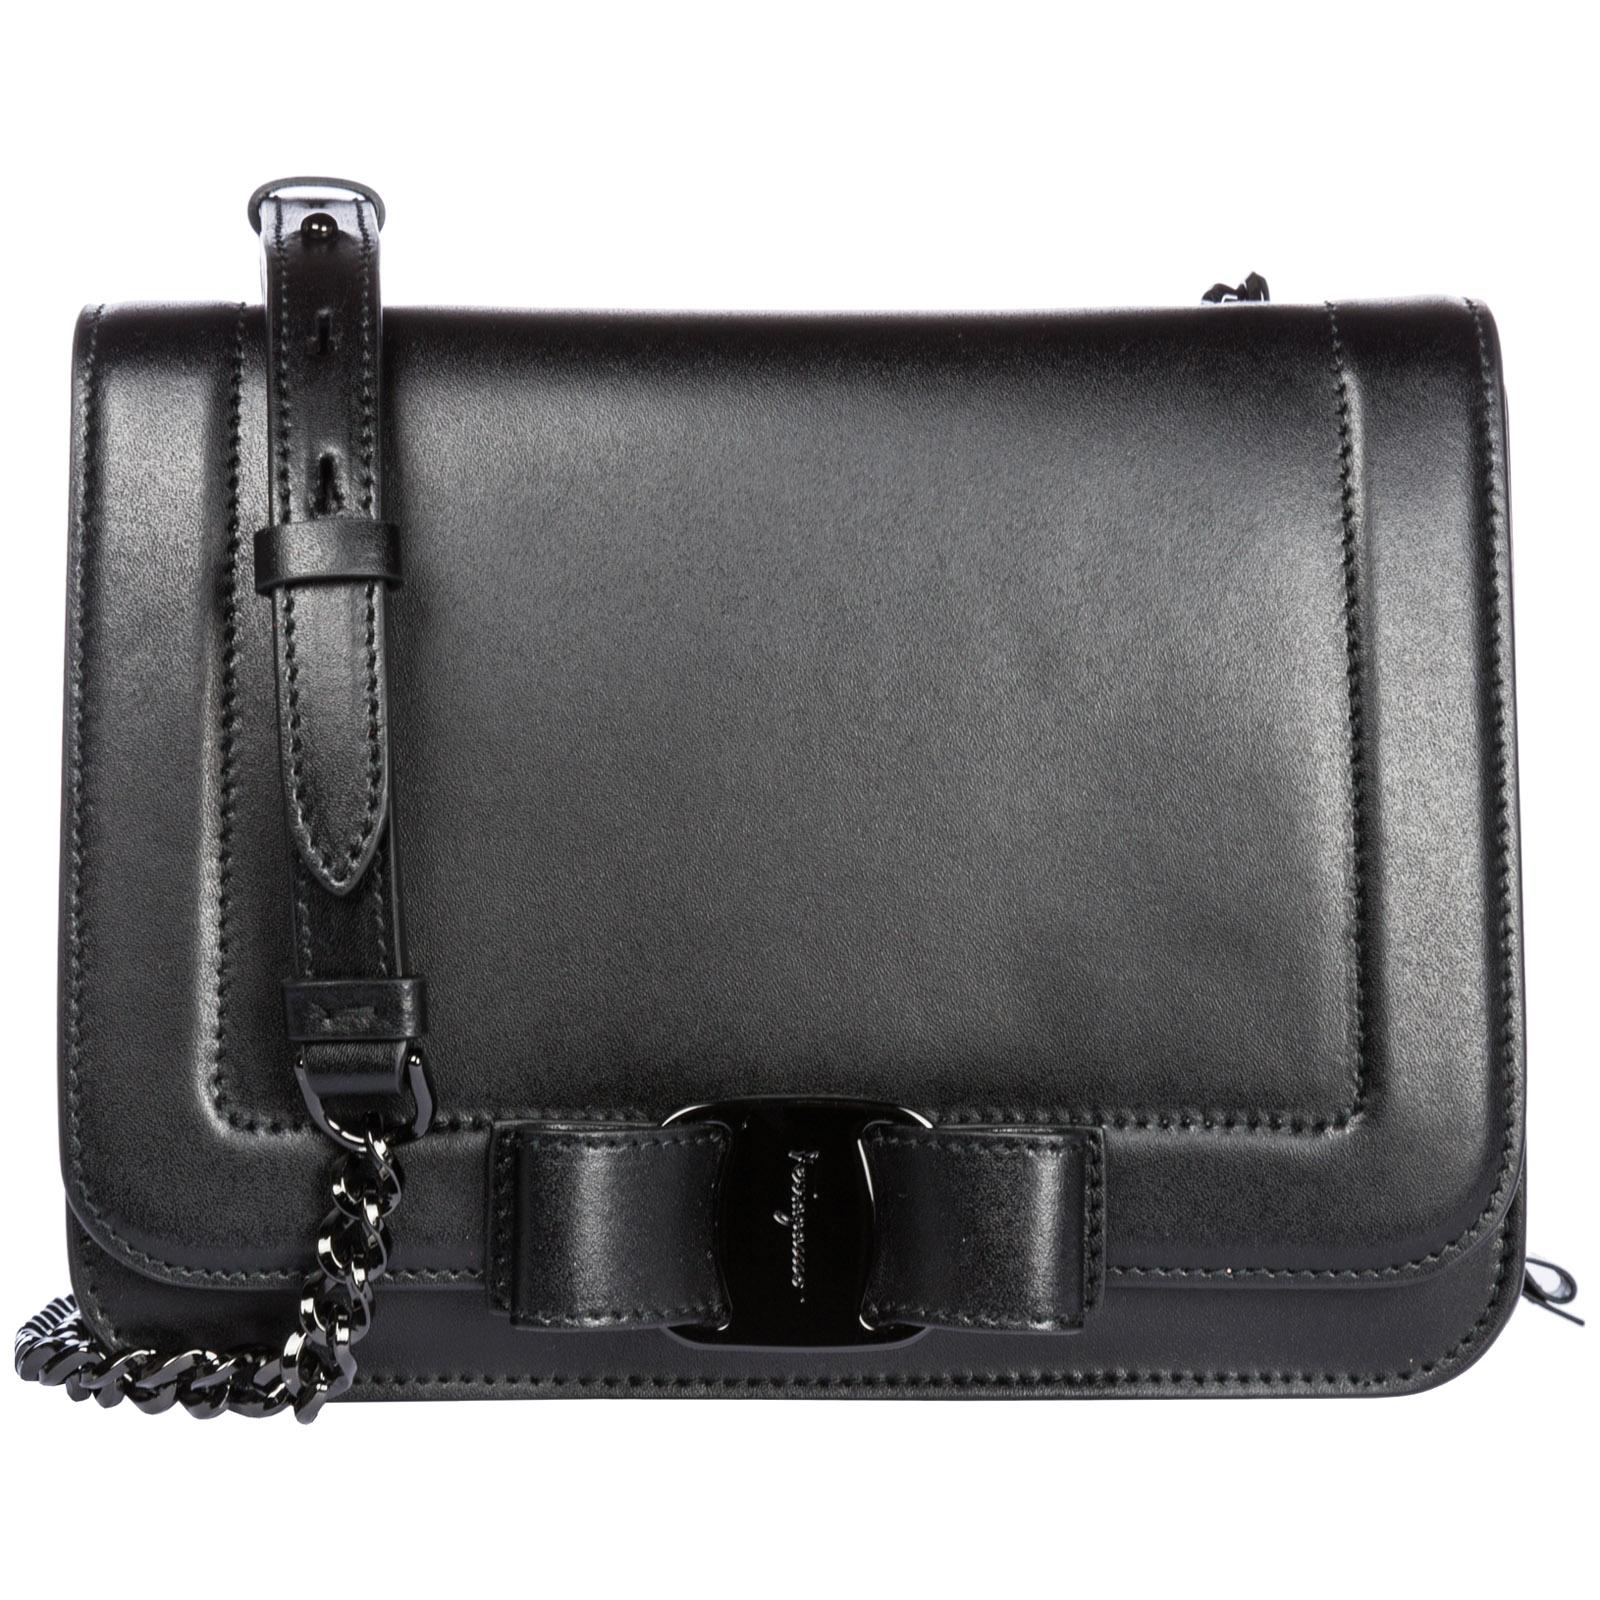 f617ee22be6a Salvatore Ferragamo Women S Leather Cross-Body Messenger Shoulder Bag Vara  Rainbow In Black